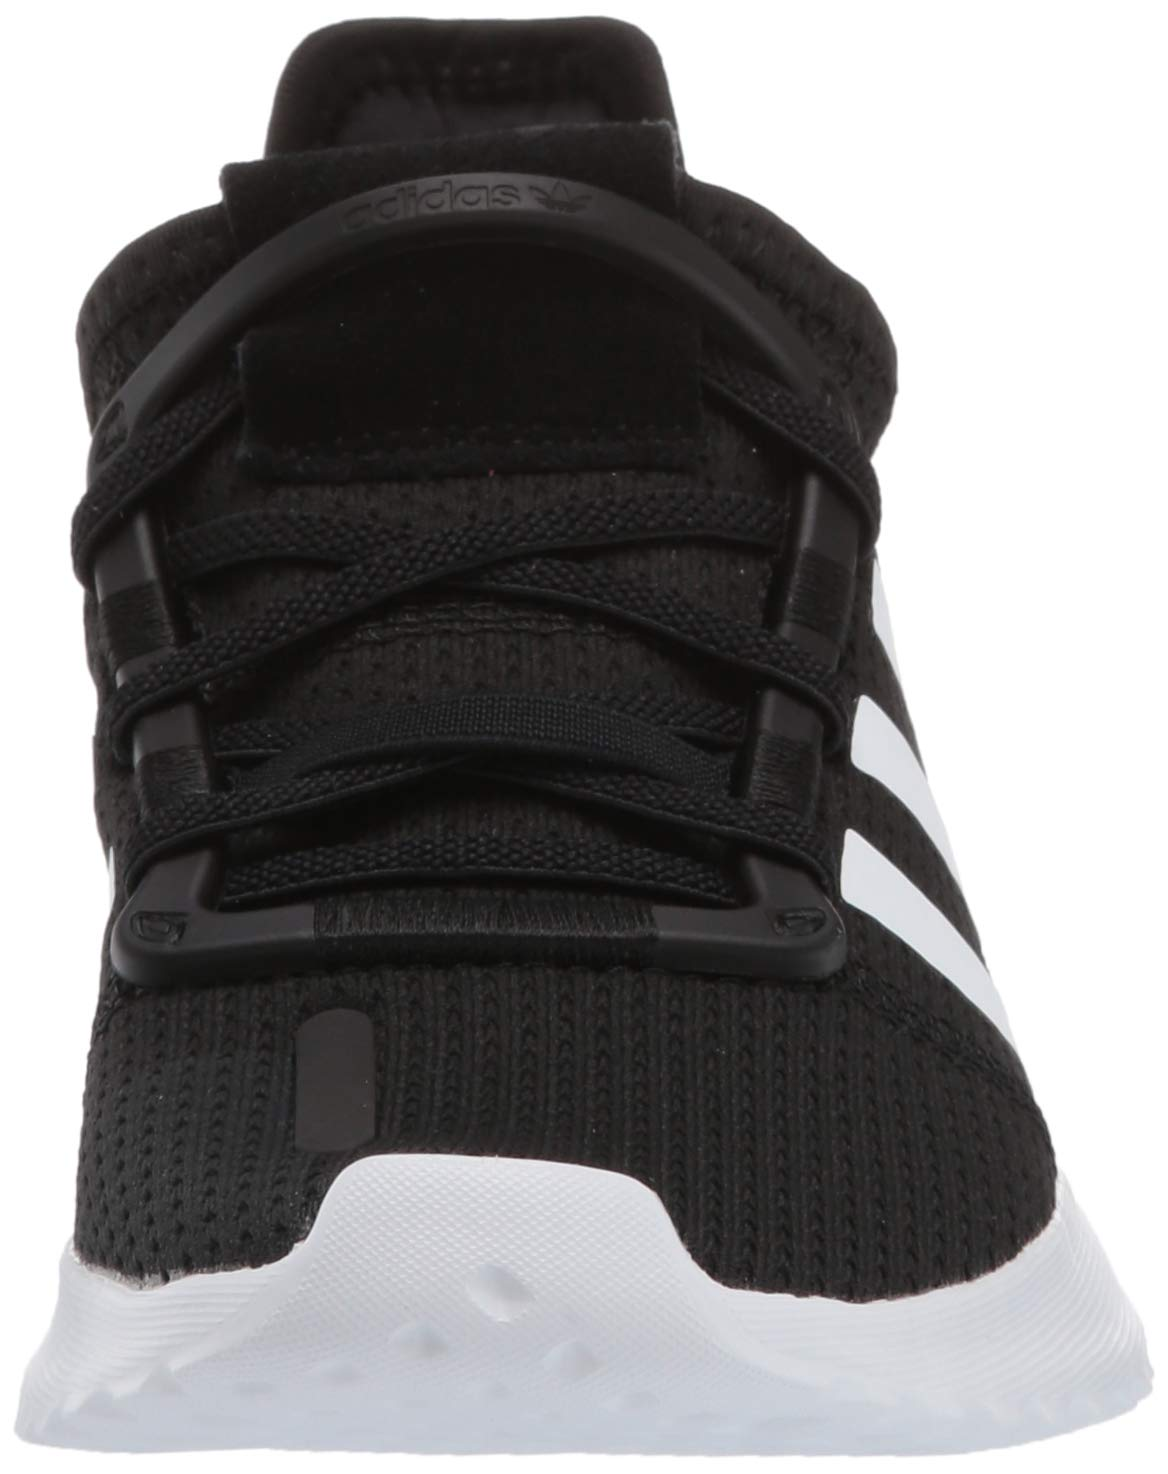 adidas Originals Baby U_Path Running Shoe Black/White/Shock red 6K M US Toddler by adidas Originals (Image #4)